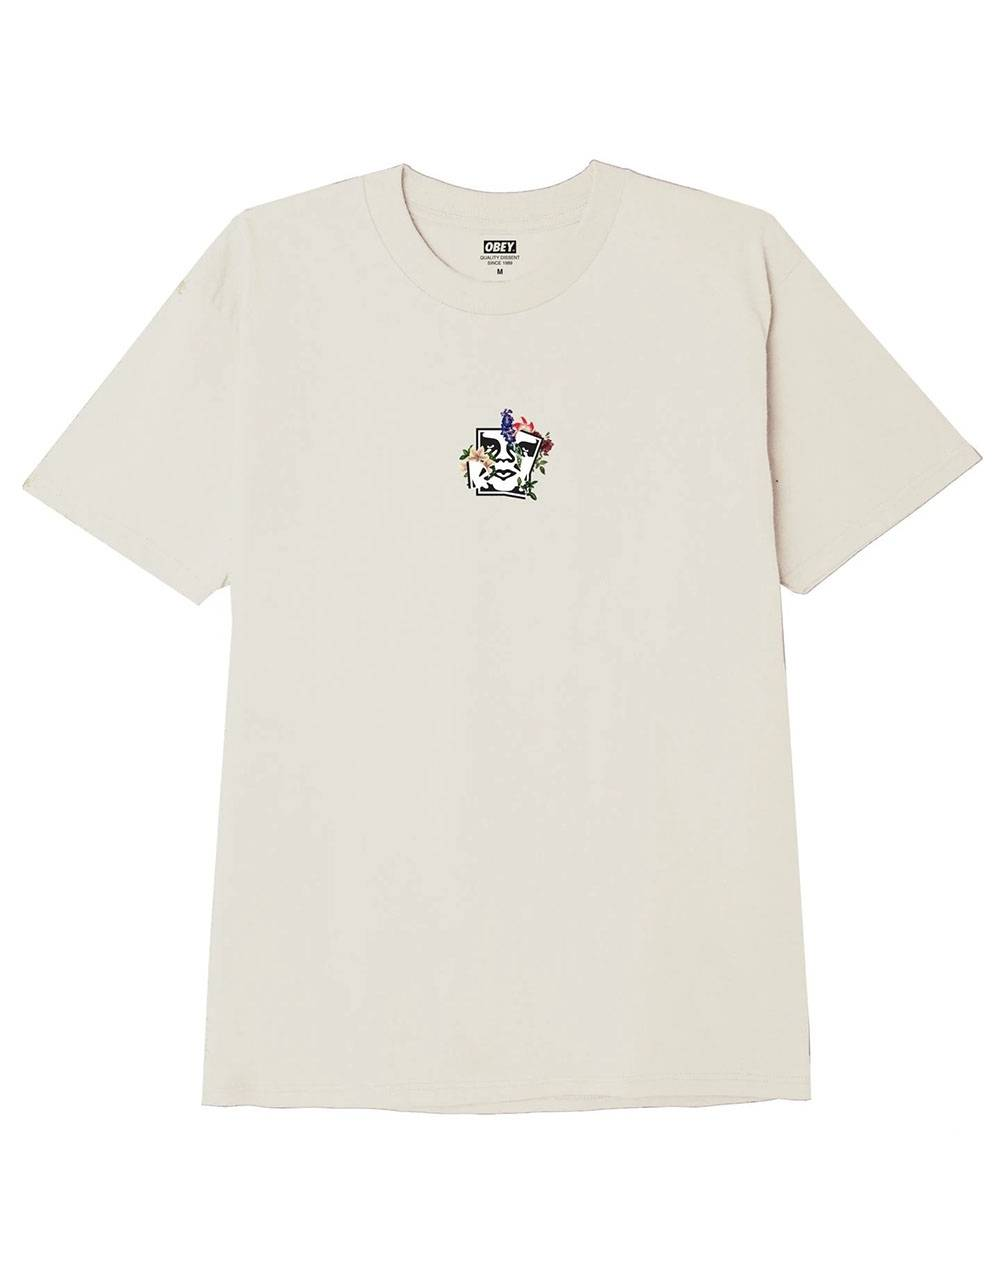 Obey Garden classic t-shirt - cream obey T-shirt 36,89€